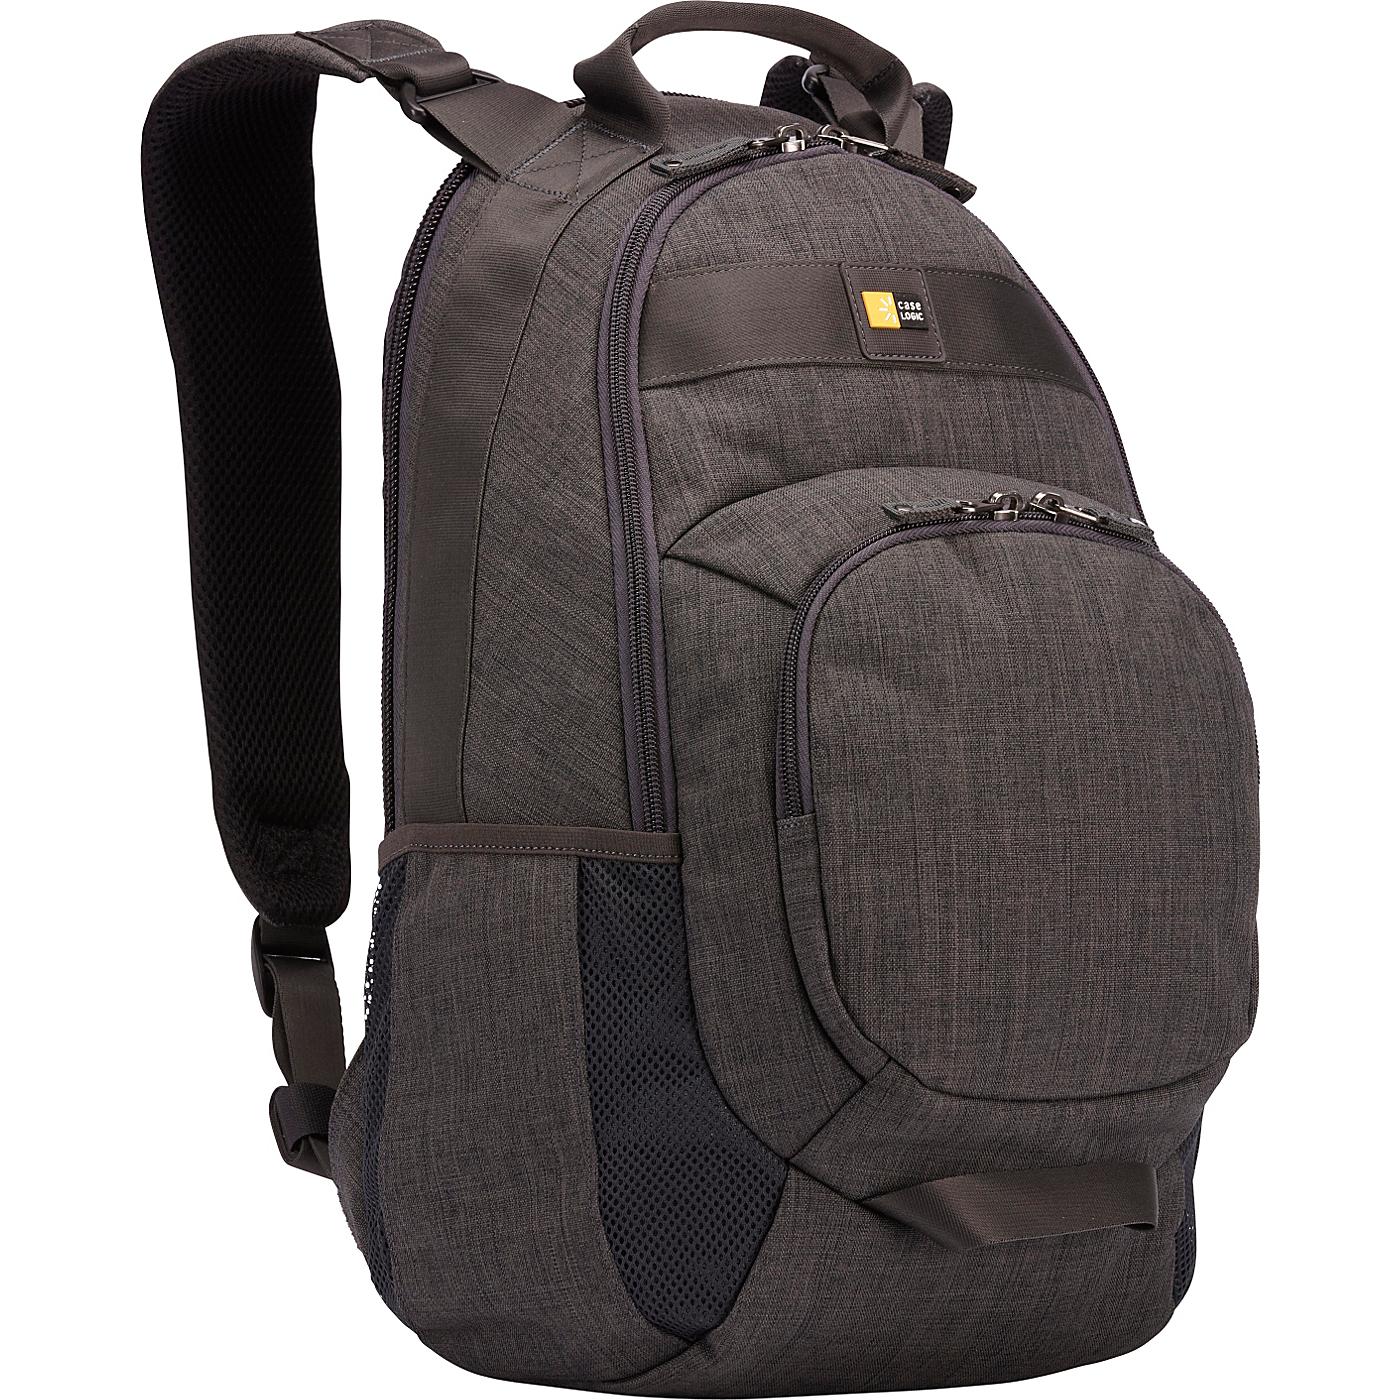 a2f977e3f5 Berkley 14 Laptop + Tablet Backpack Anthracite Case Logic Laptop B ...